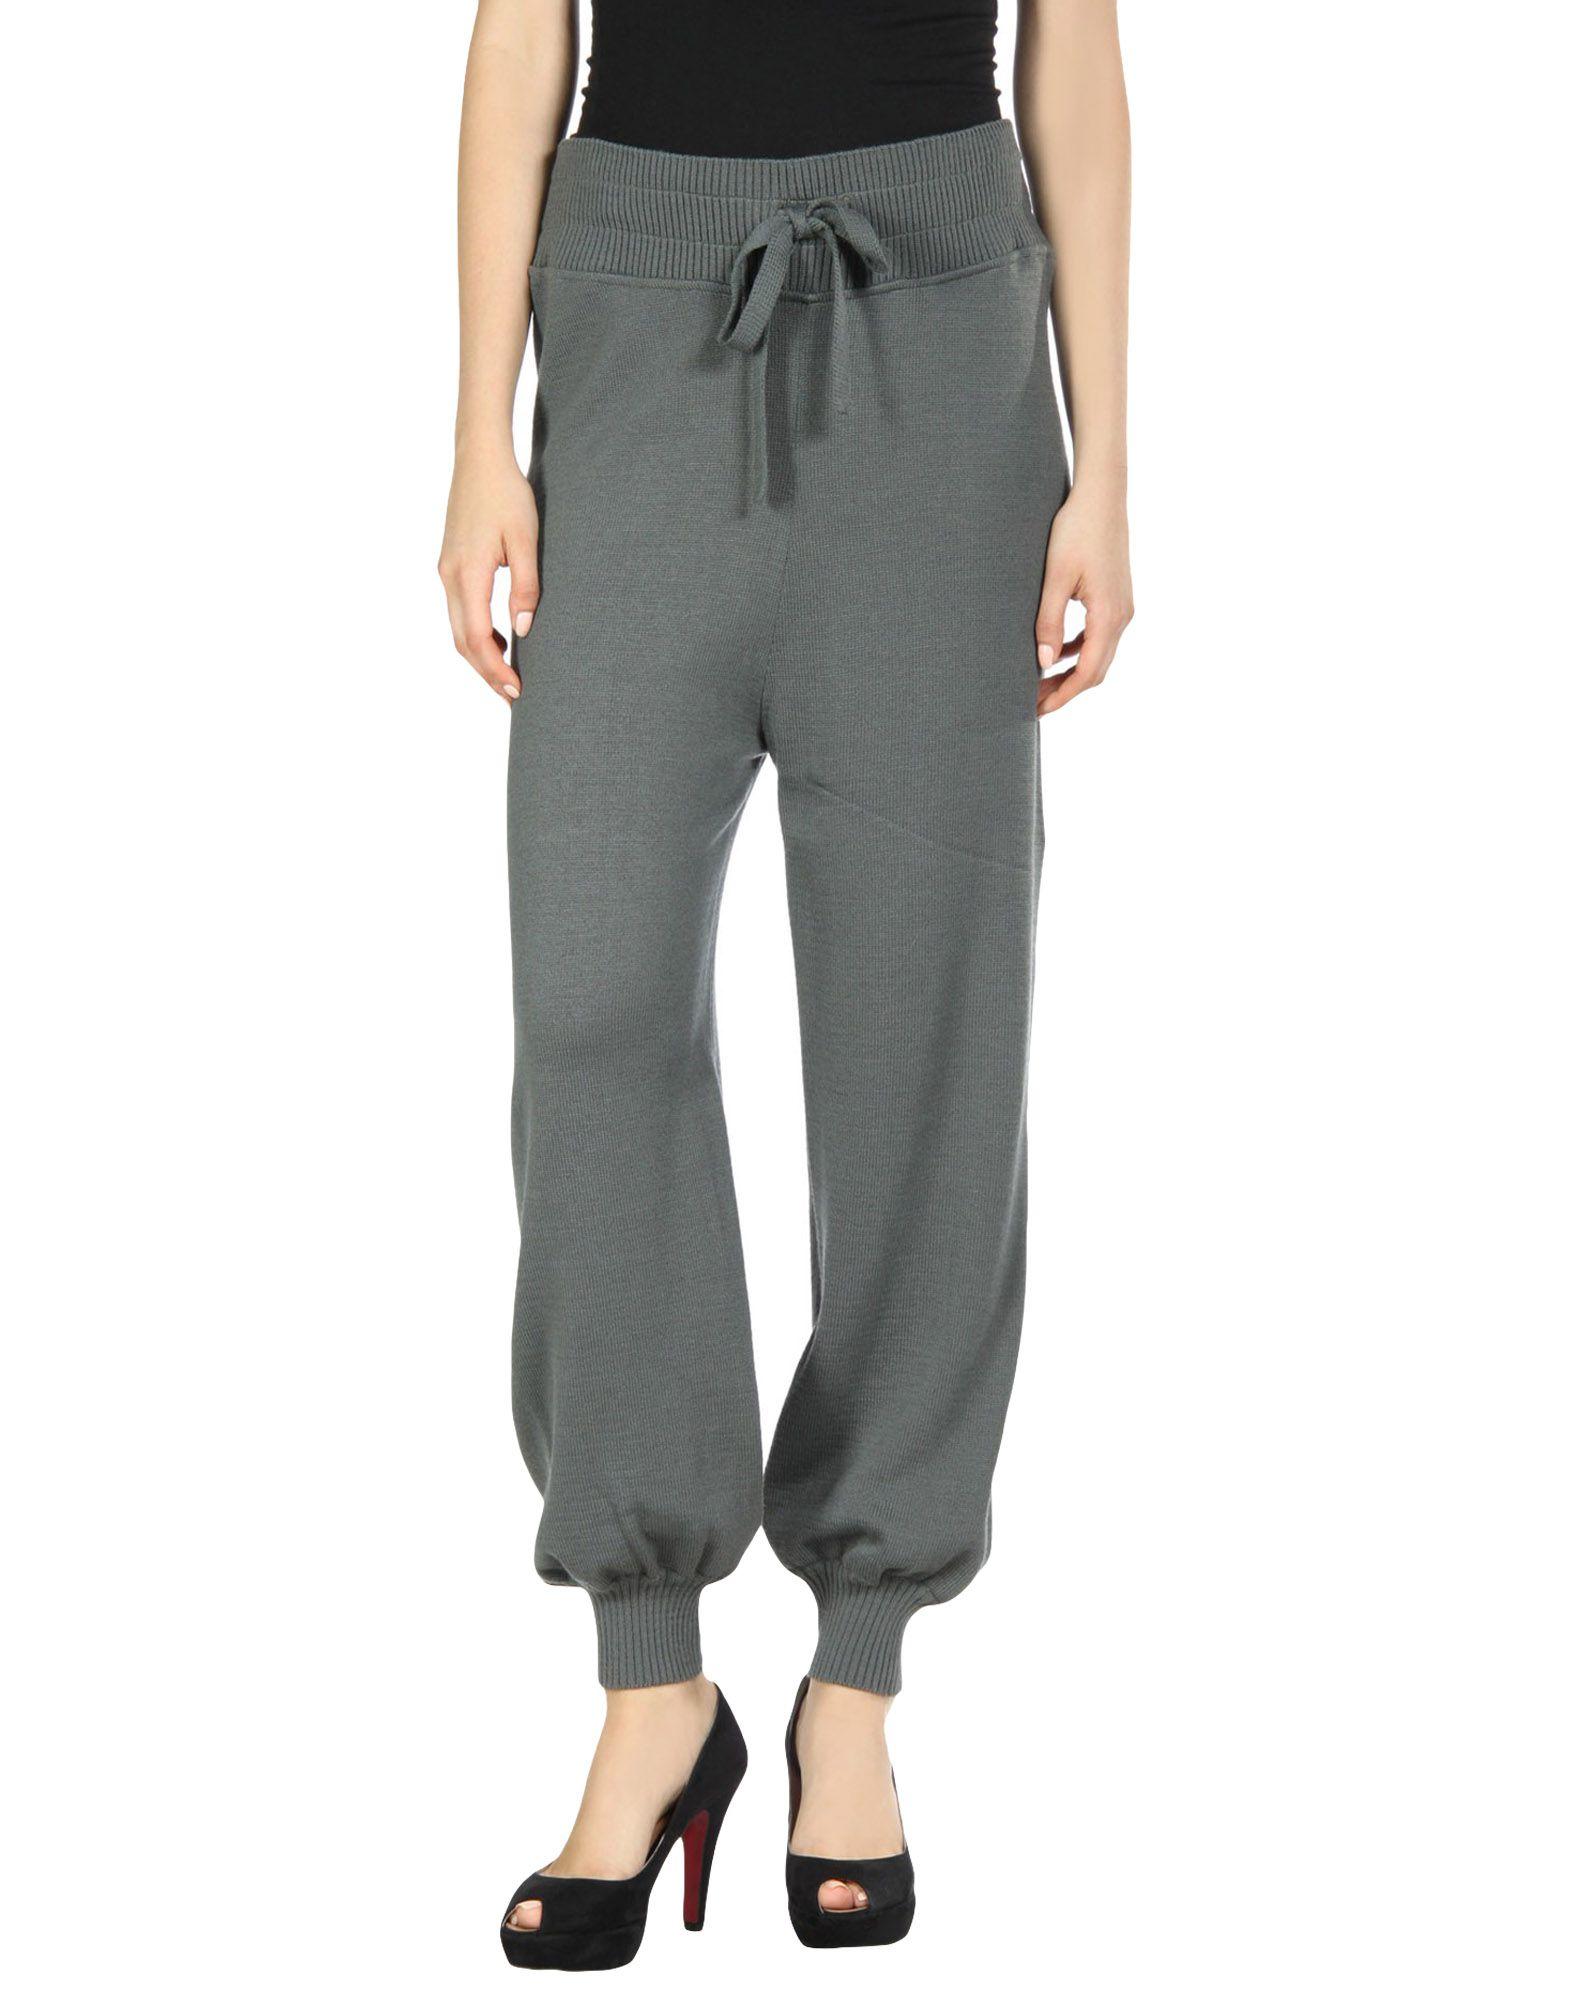 IVAN GRUNDAHL Casual Pants in Grey